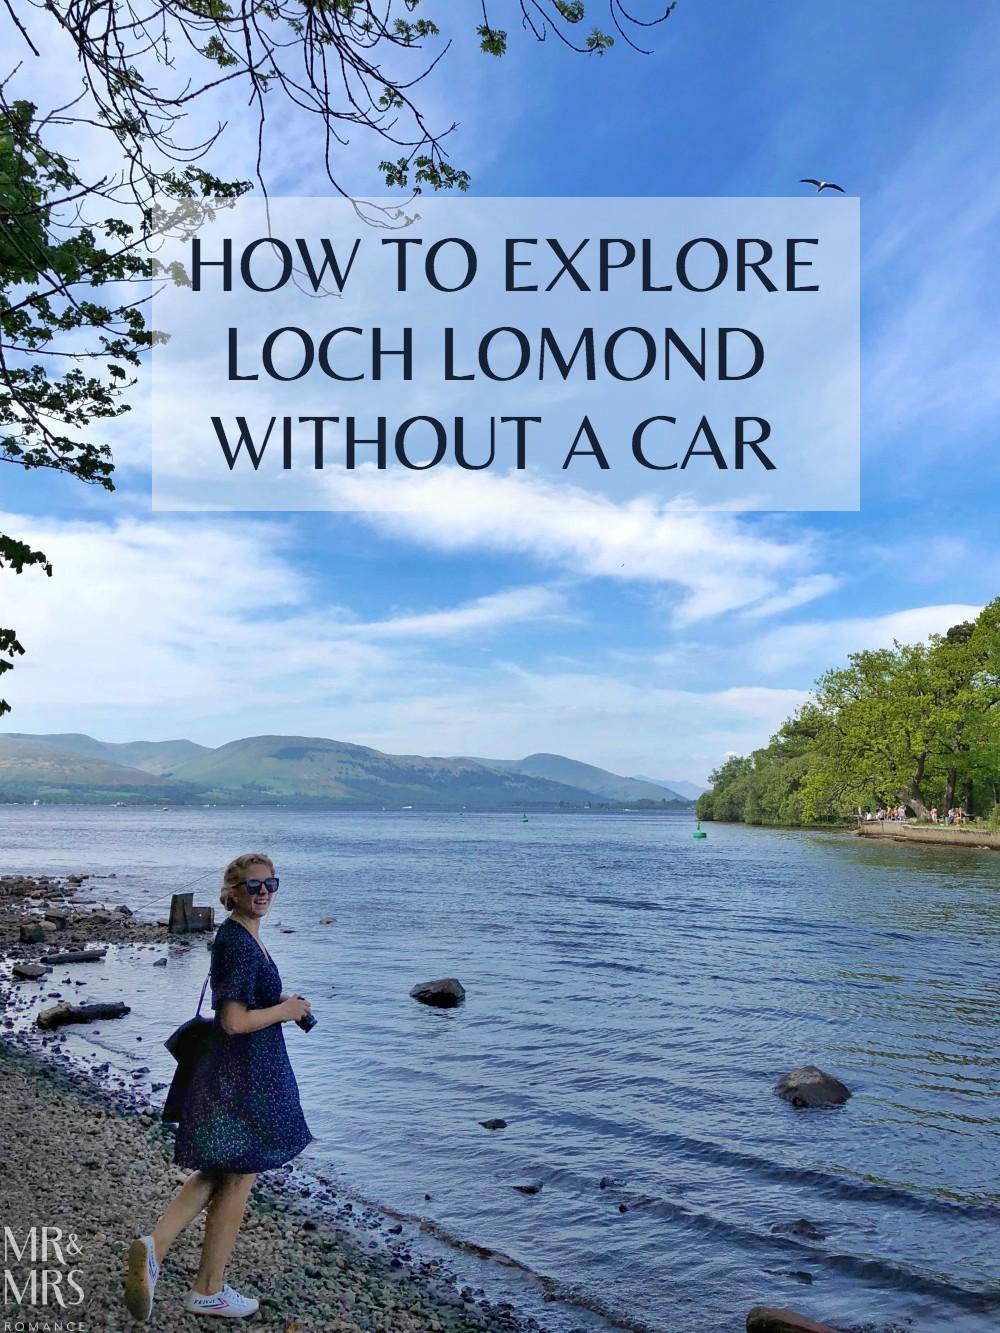 Loch Lomond without a car - Mr & Mrs Romance - title